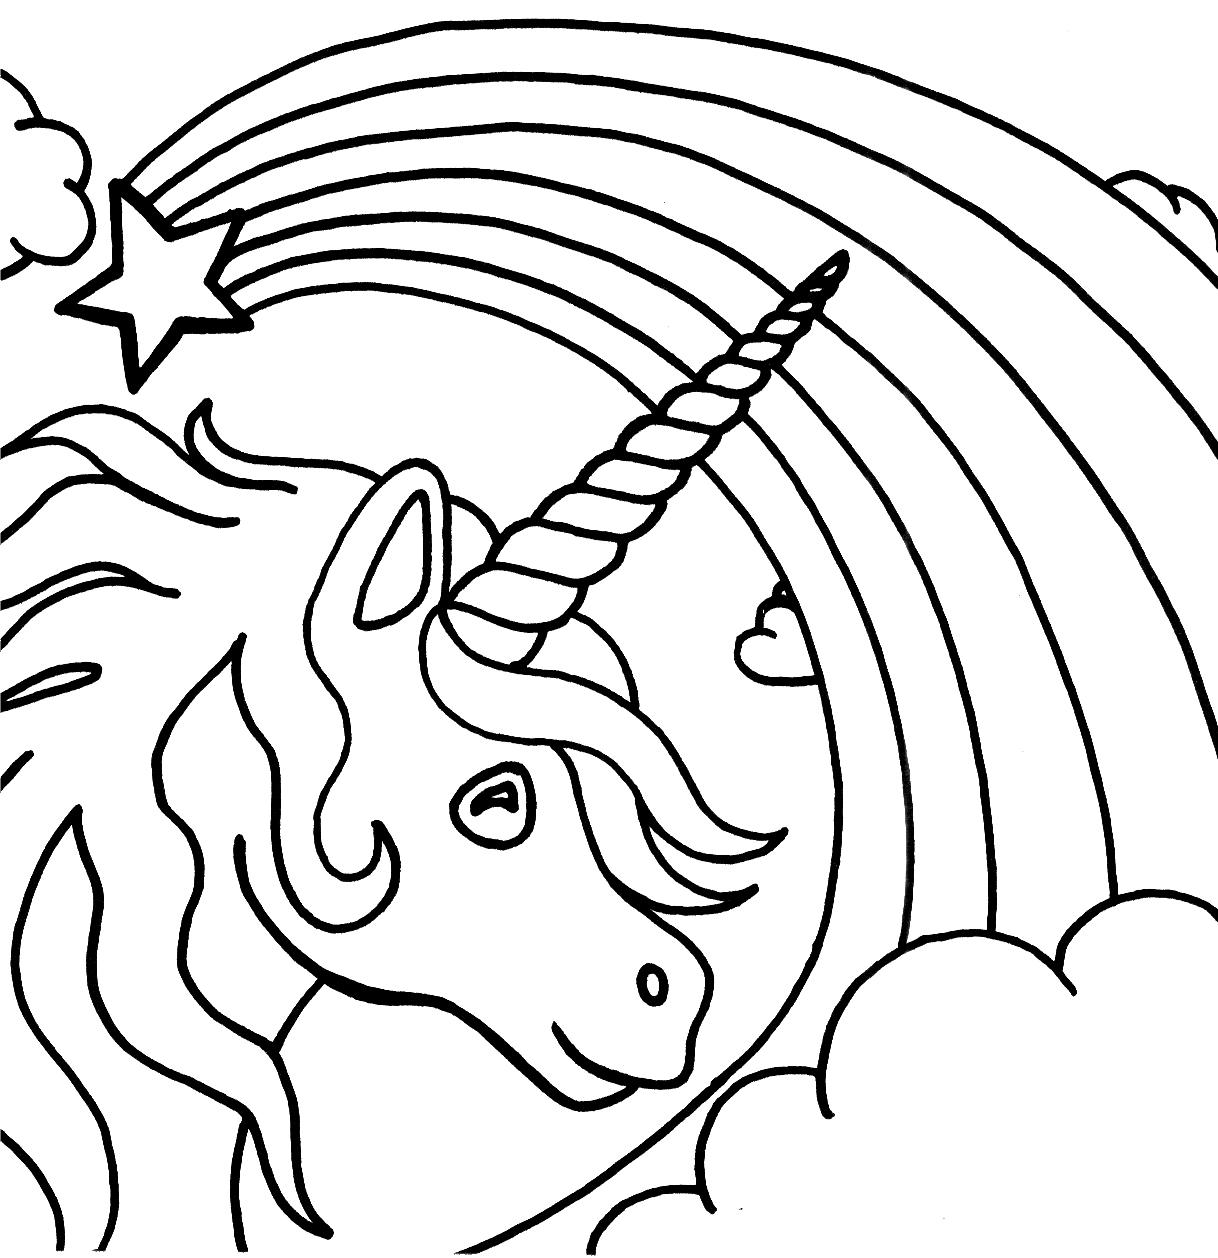 unicorn pictures printable free printable unicorn coloring pages for kids printable unicorn pictures